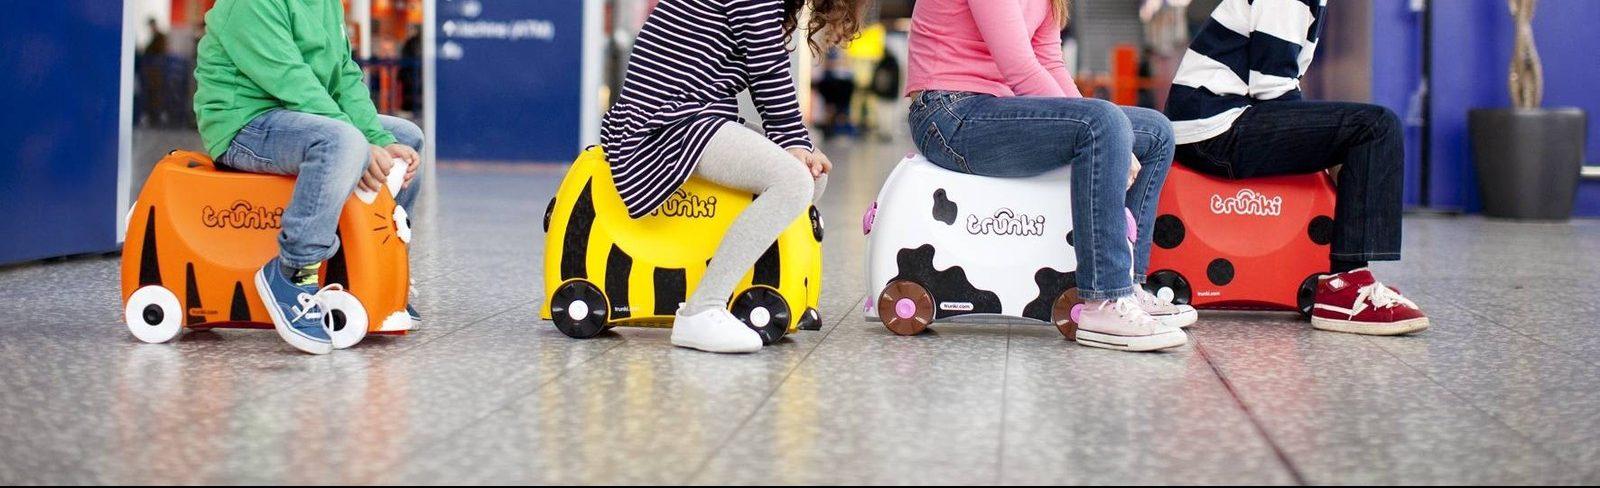 Trunki kids animal ride-on suitcase